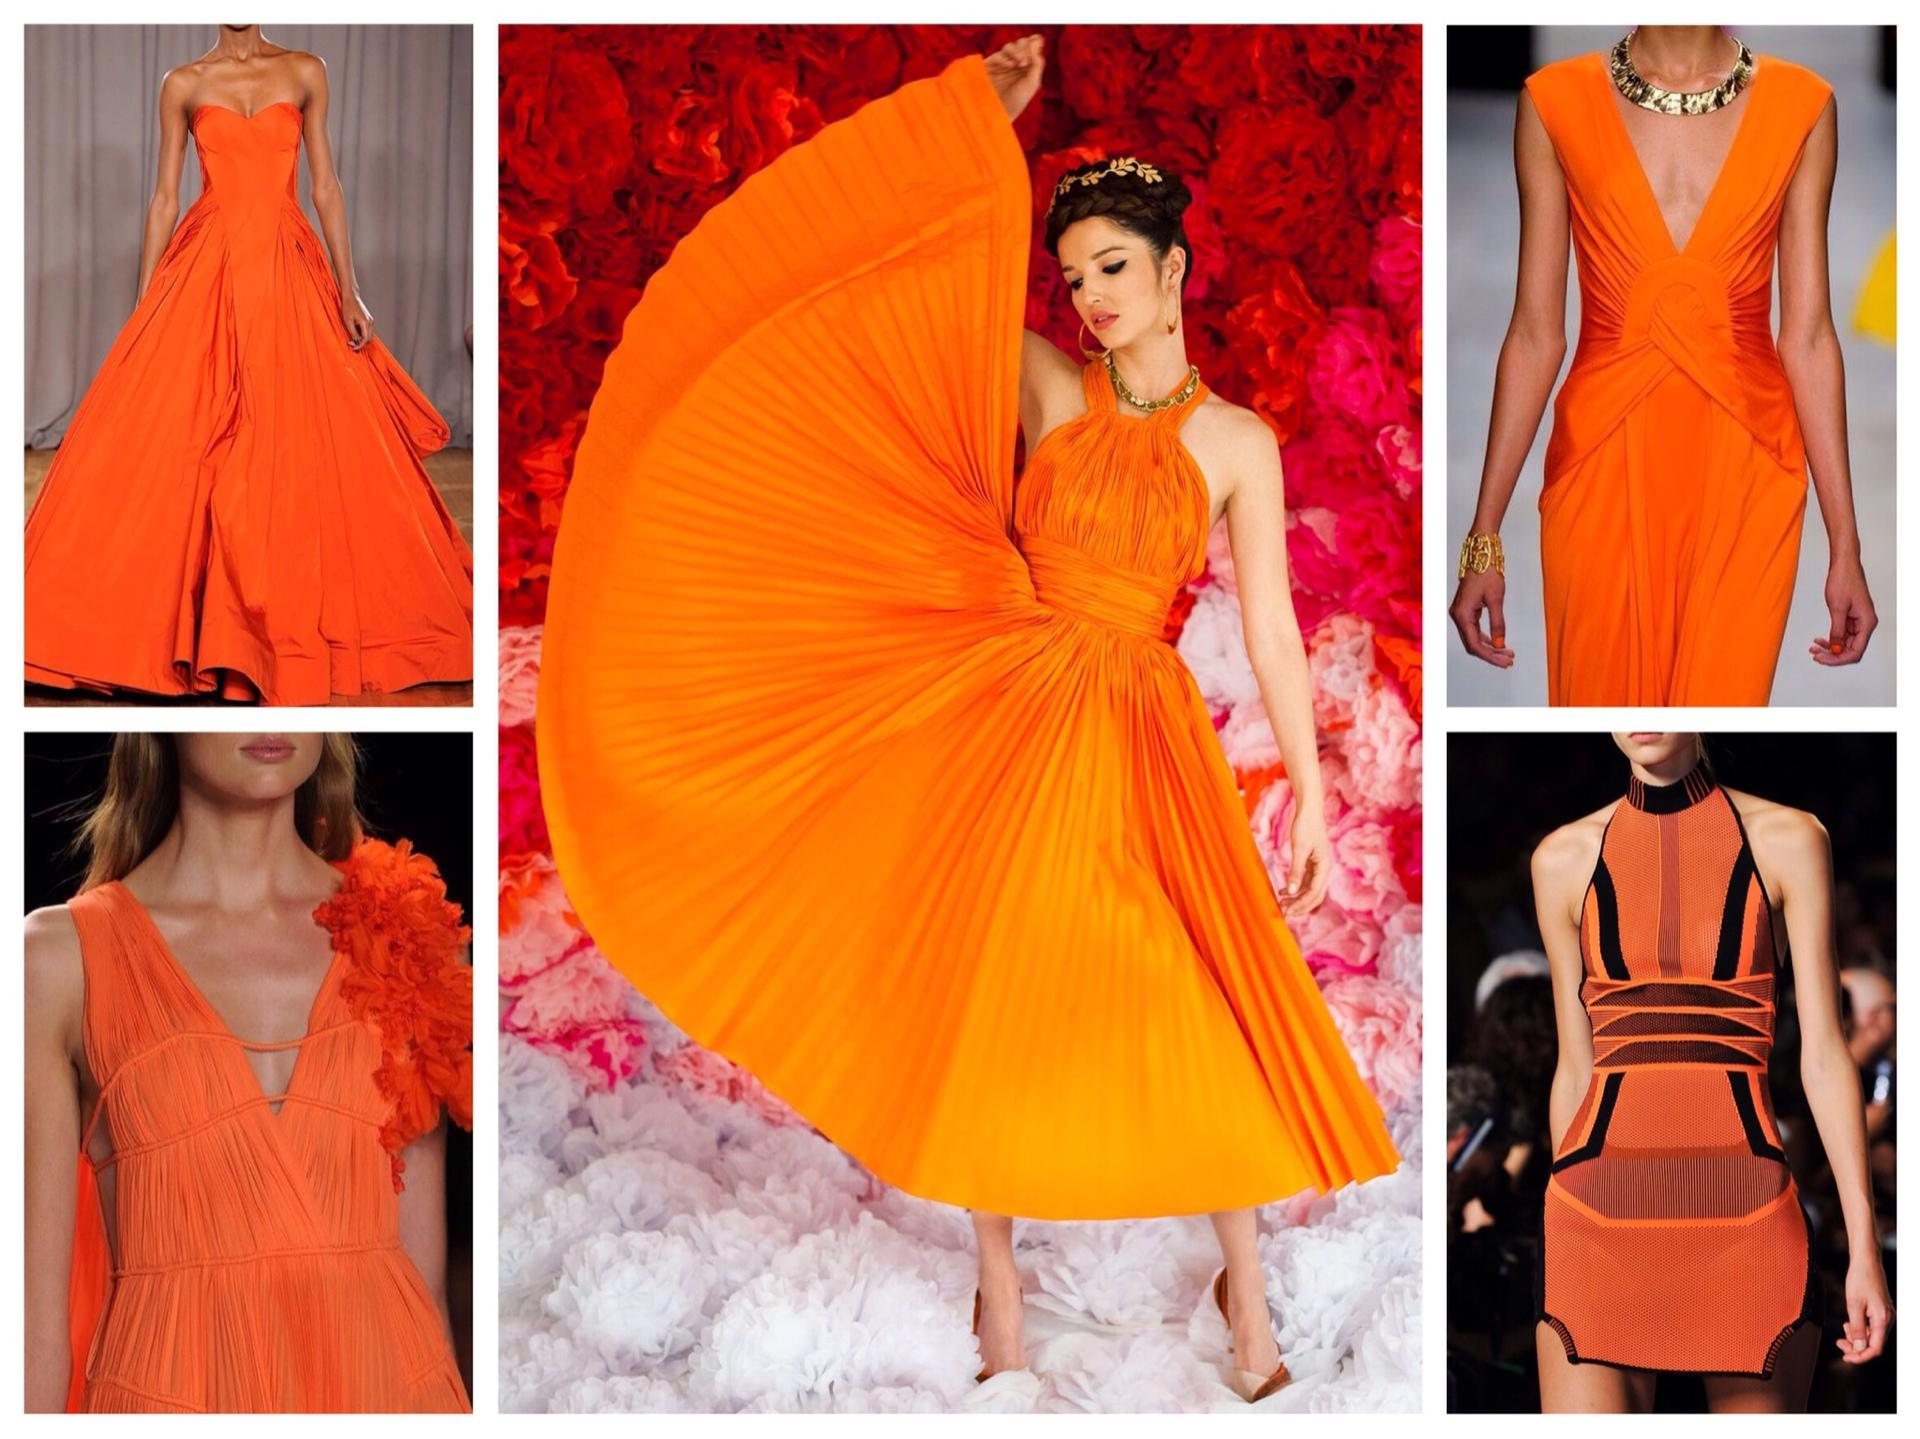 049cceb31a0 Оранжевое платье  фото